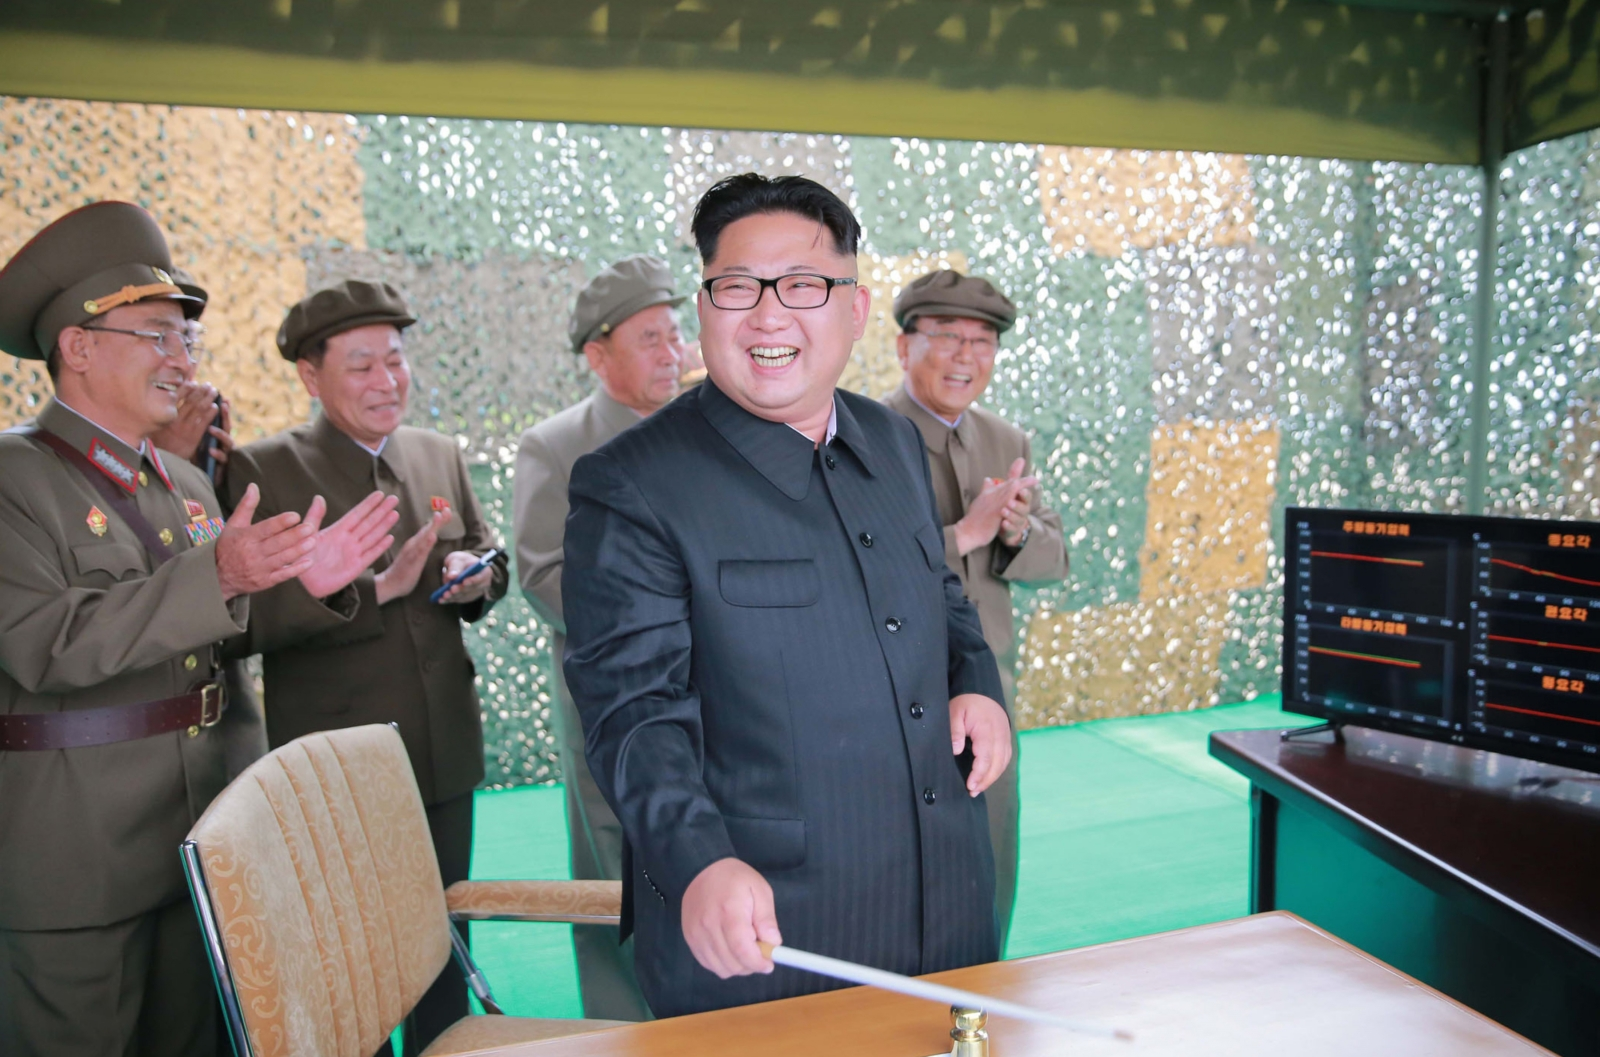 North Korean leader Kim Jong-Un (C) inspecting a test of the surface-to-surface medium long-range strategic ballistic missile